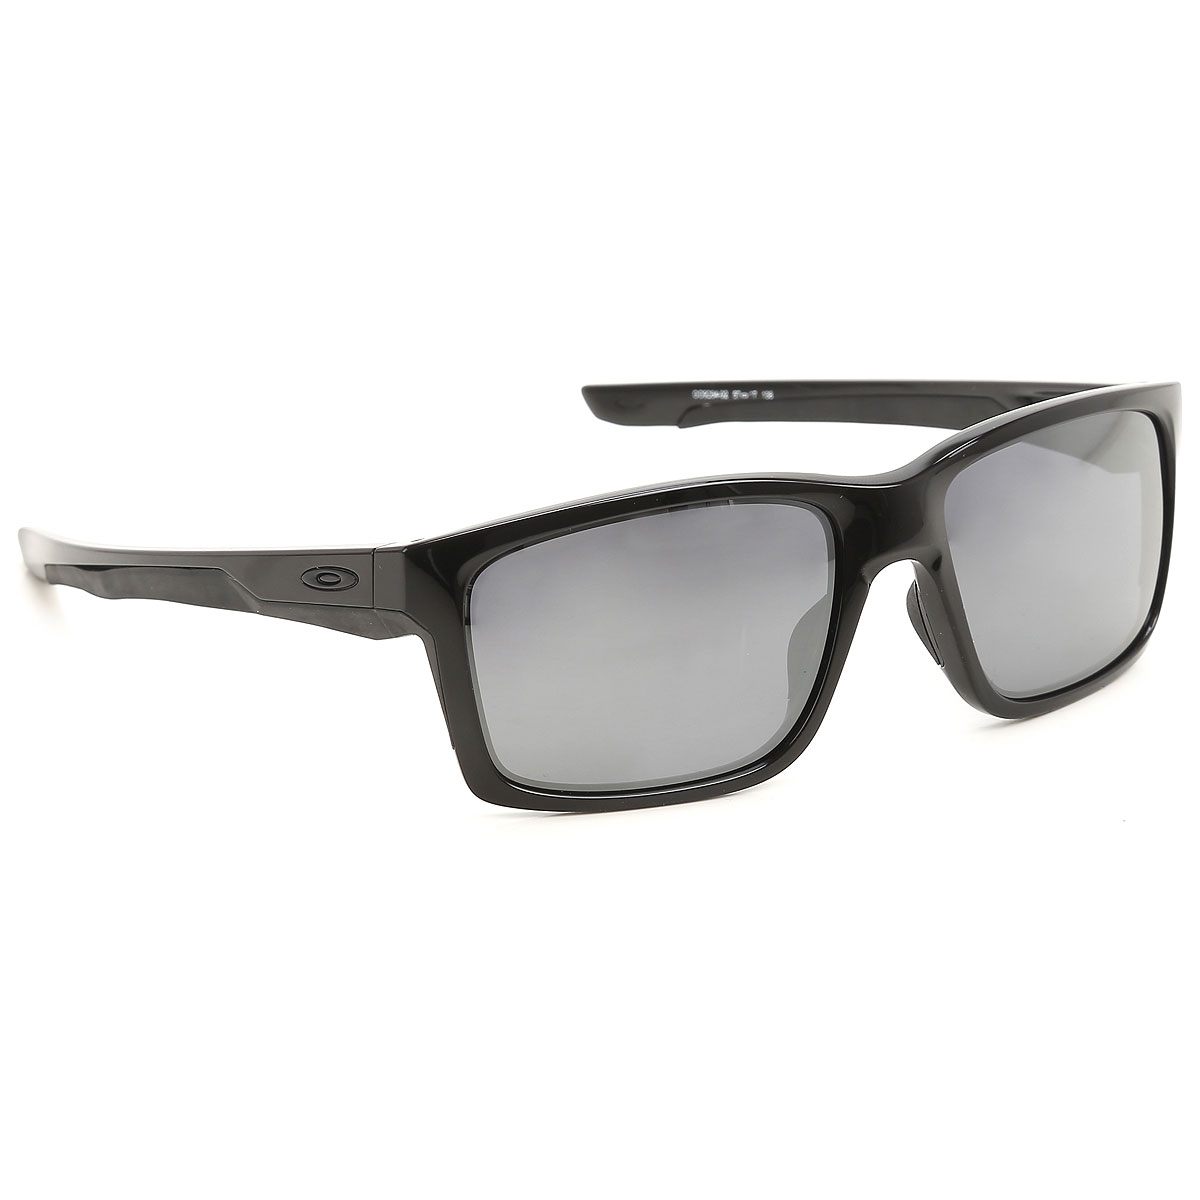 Oakley Sunglasses On Sale, Black, 2019